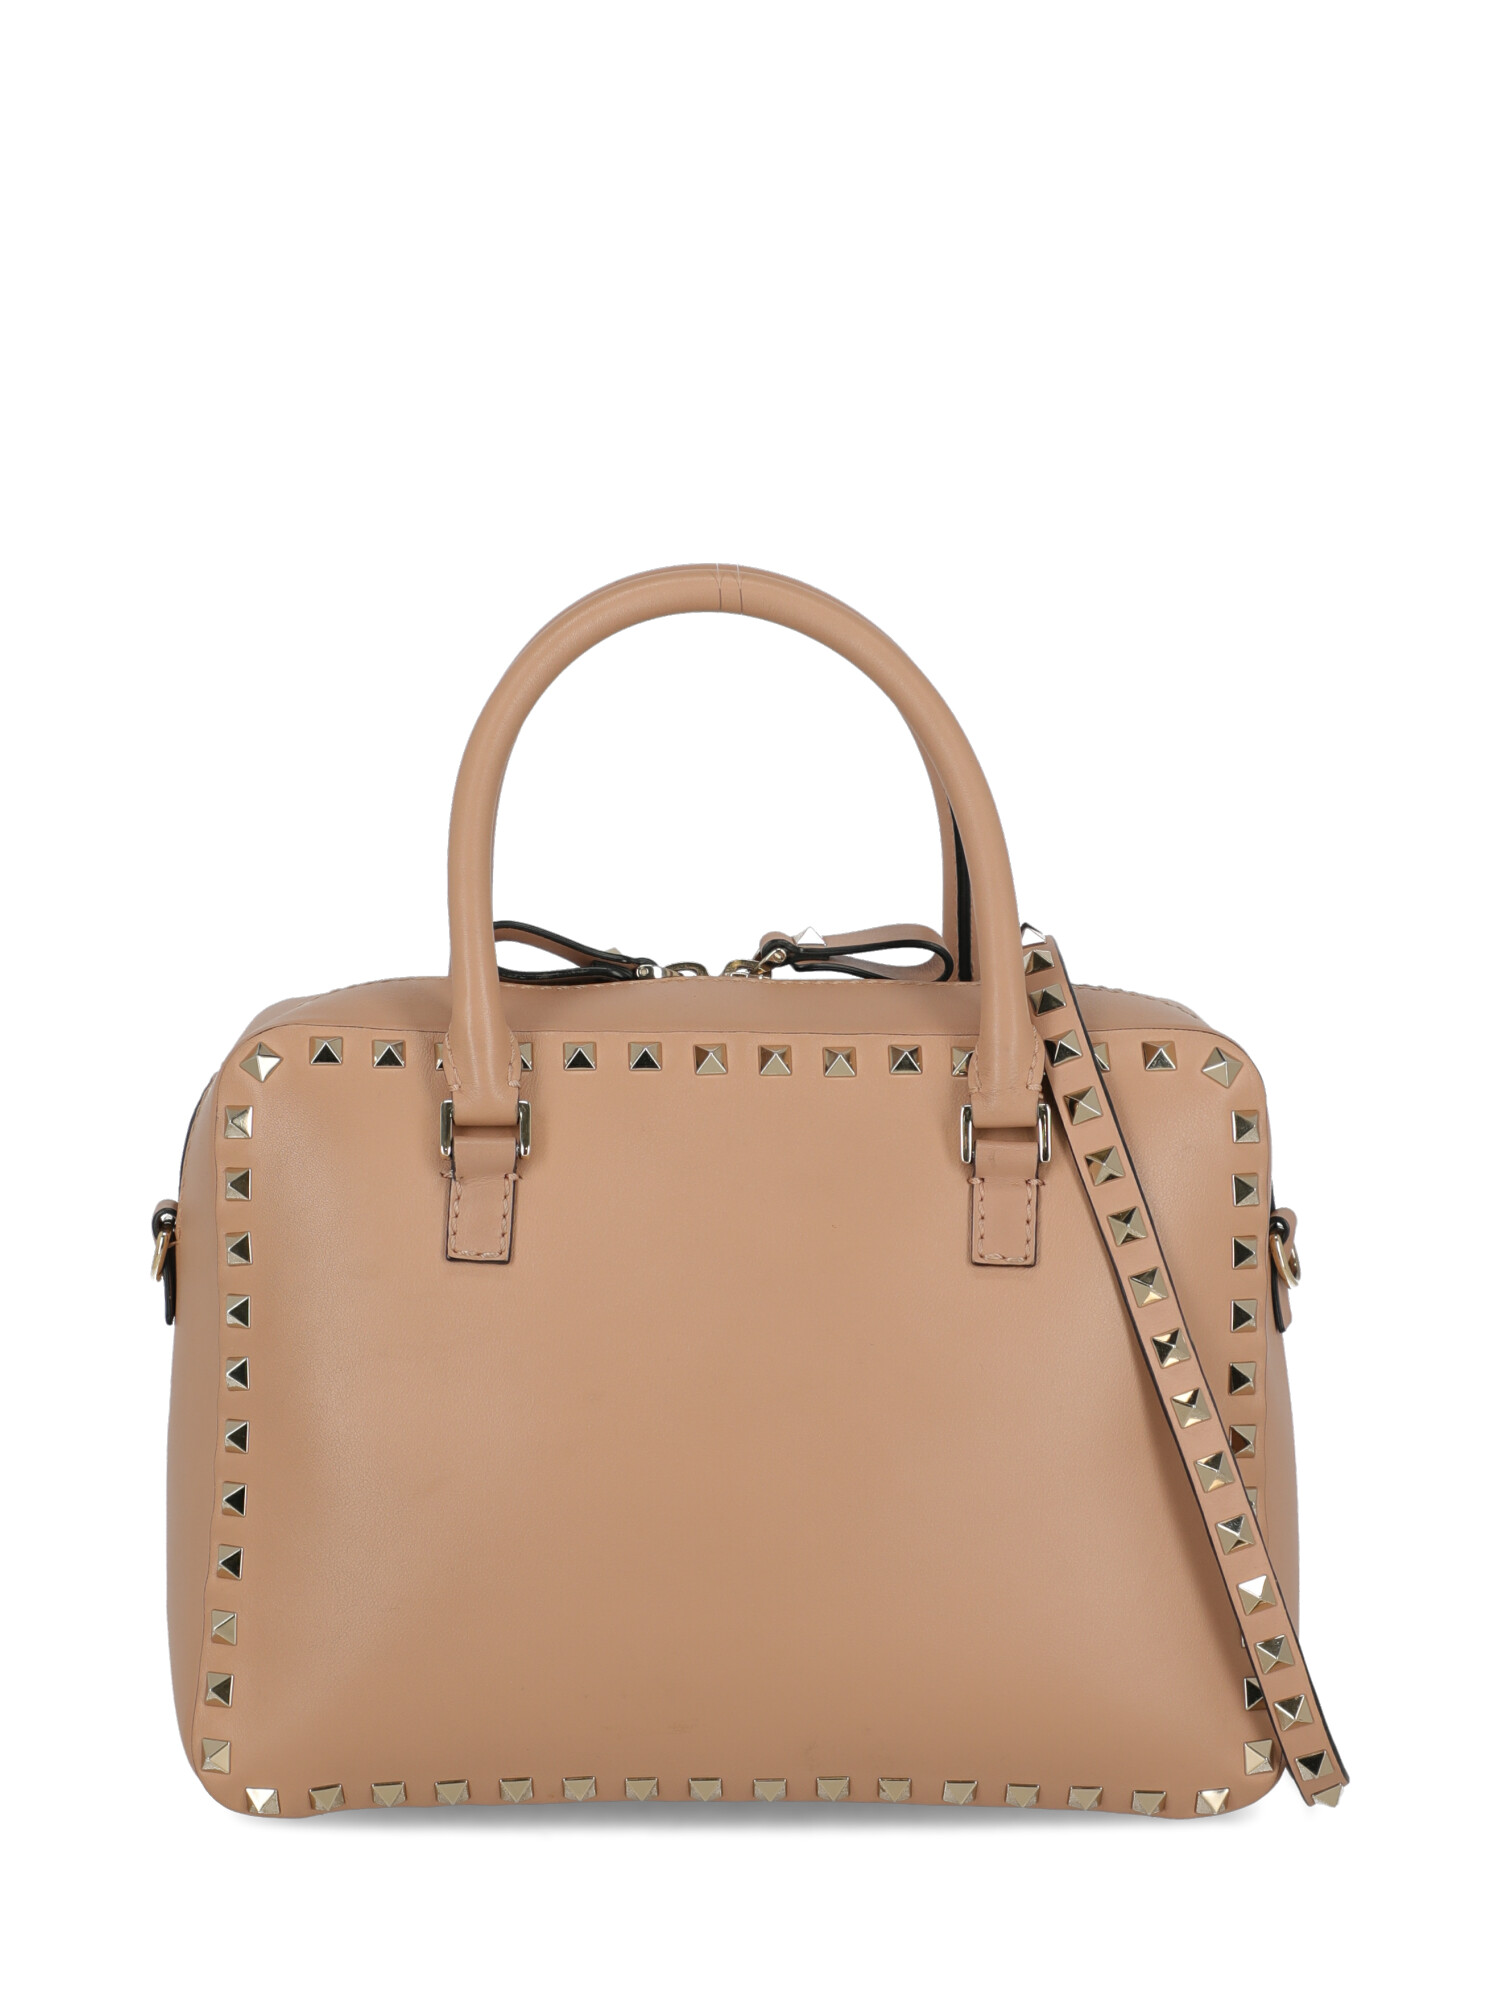 Pre-owned Valentino Garavani Bag In Pink